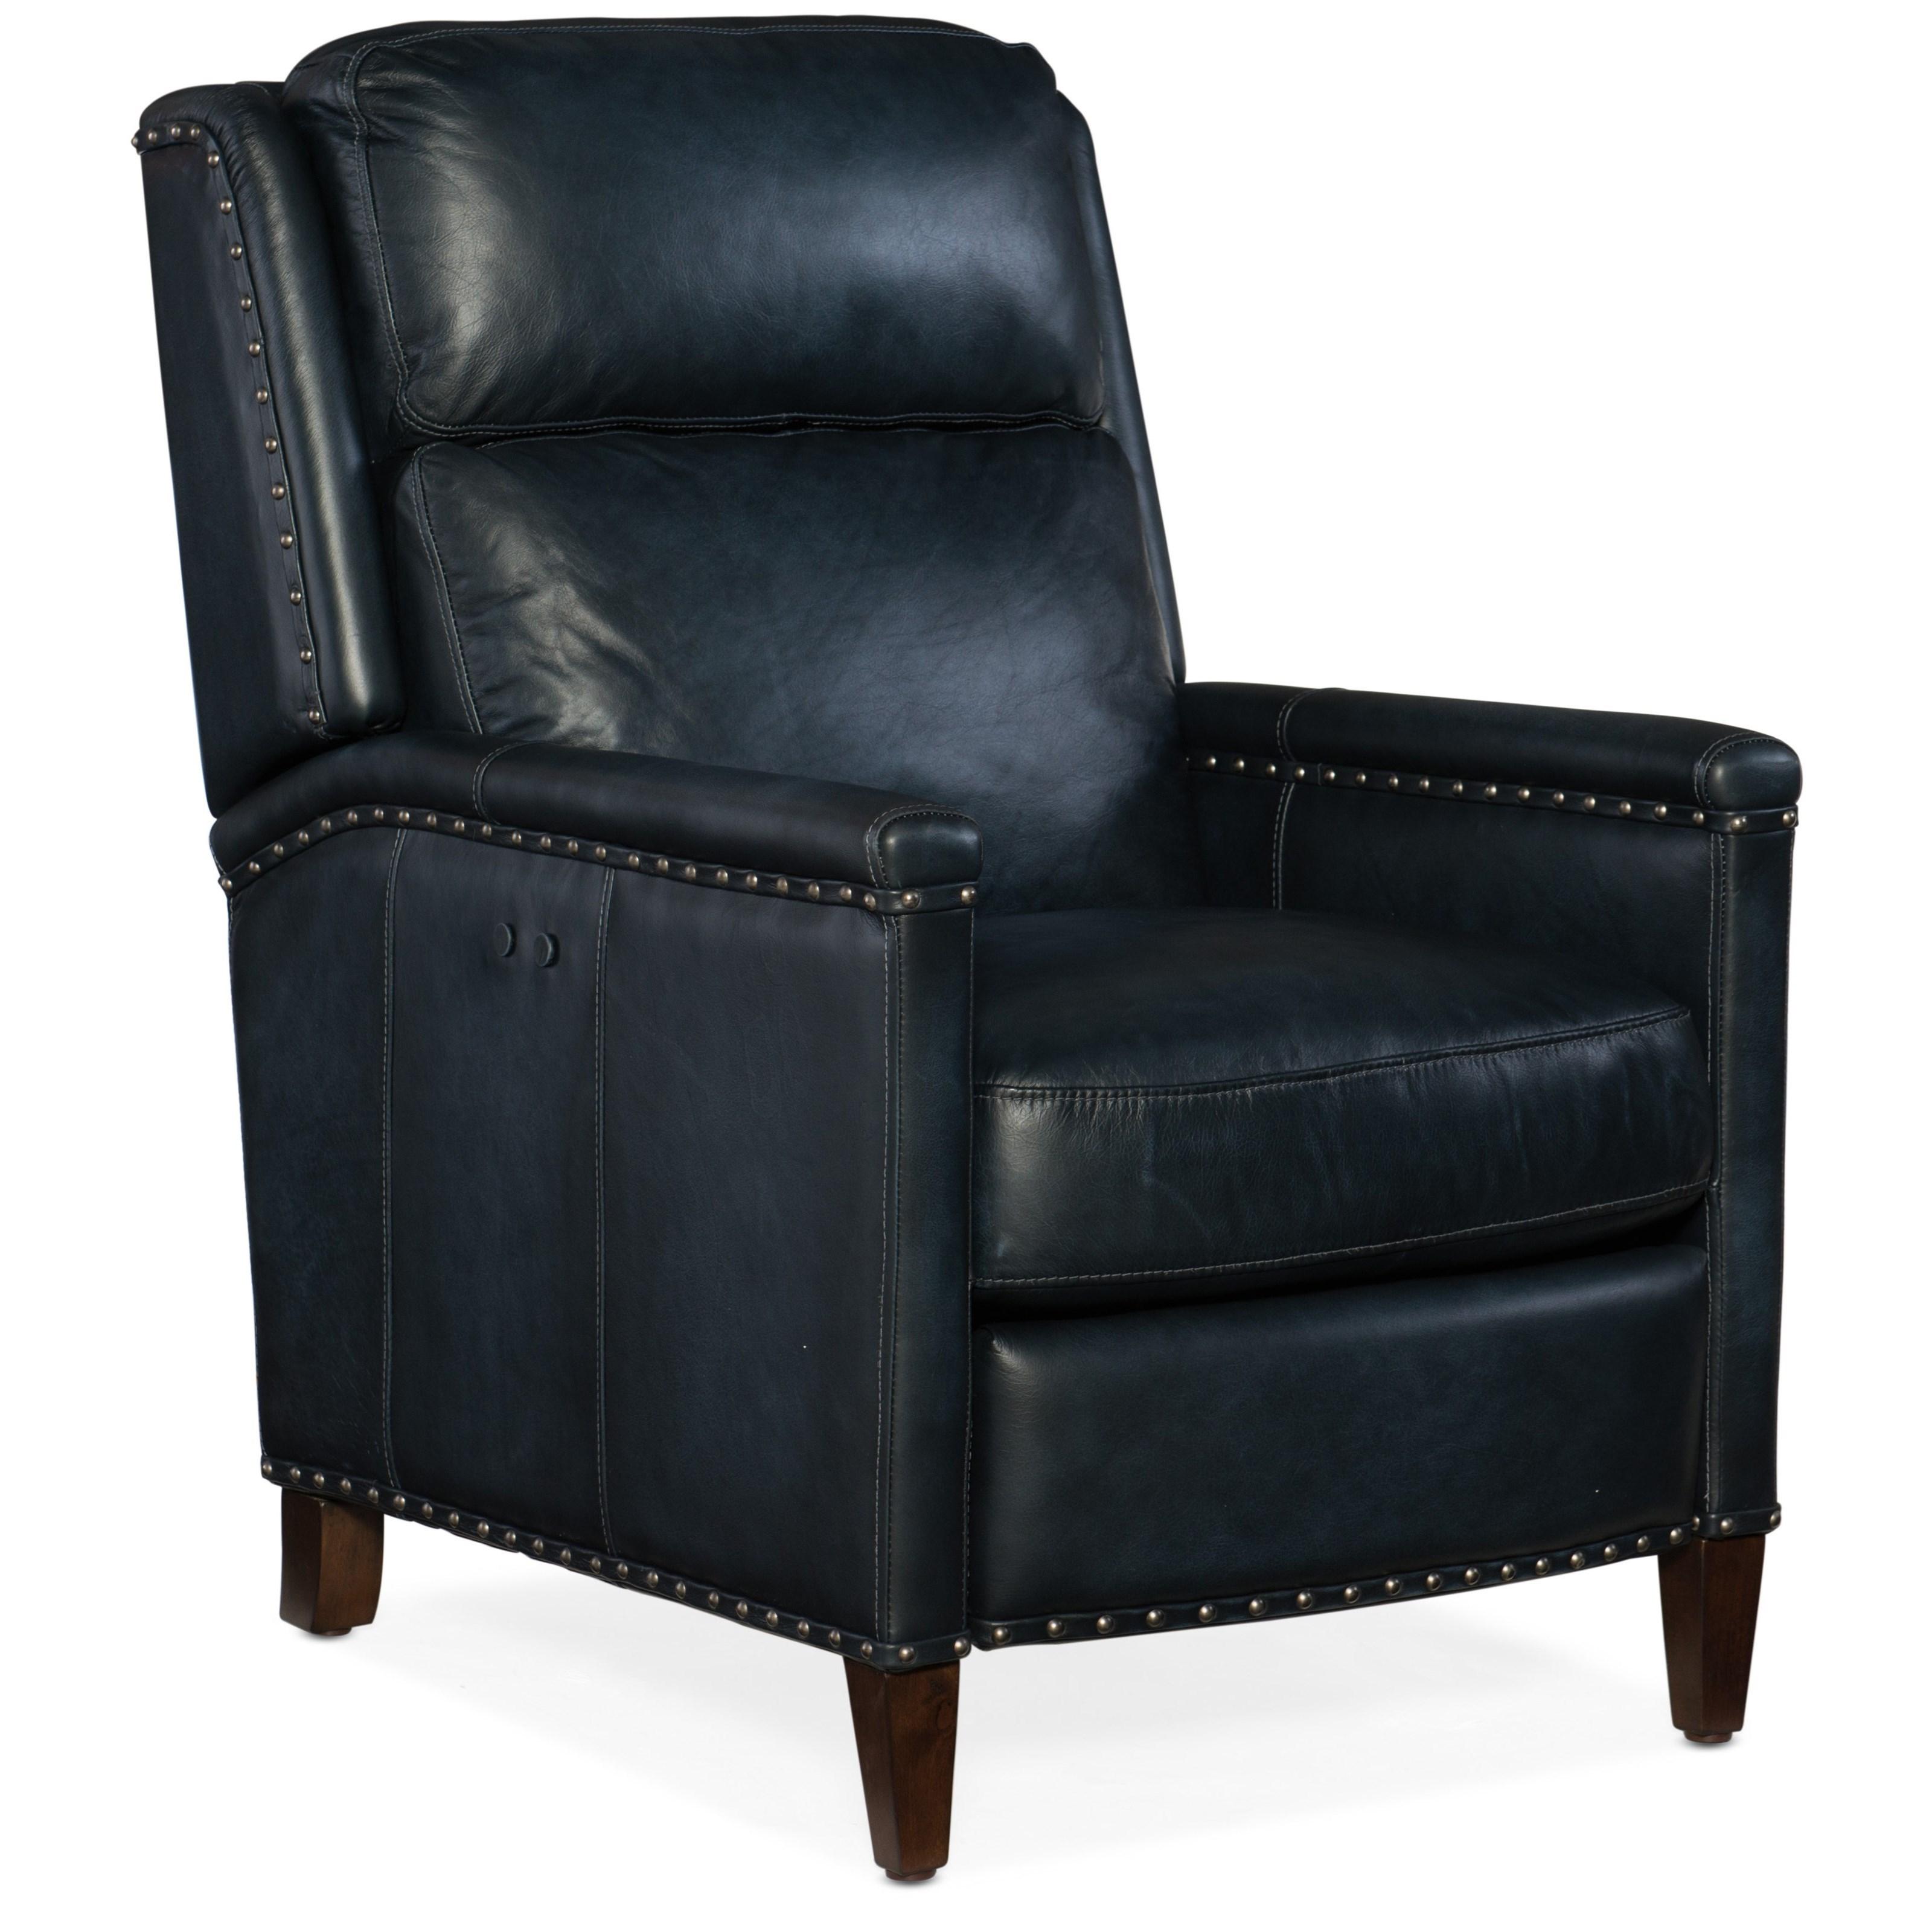 Reclining Chairs Zen Power Recliner by Hooker Furniture at Baer's Furniture